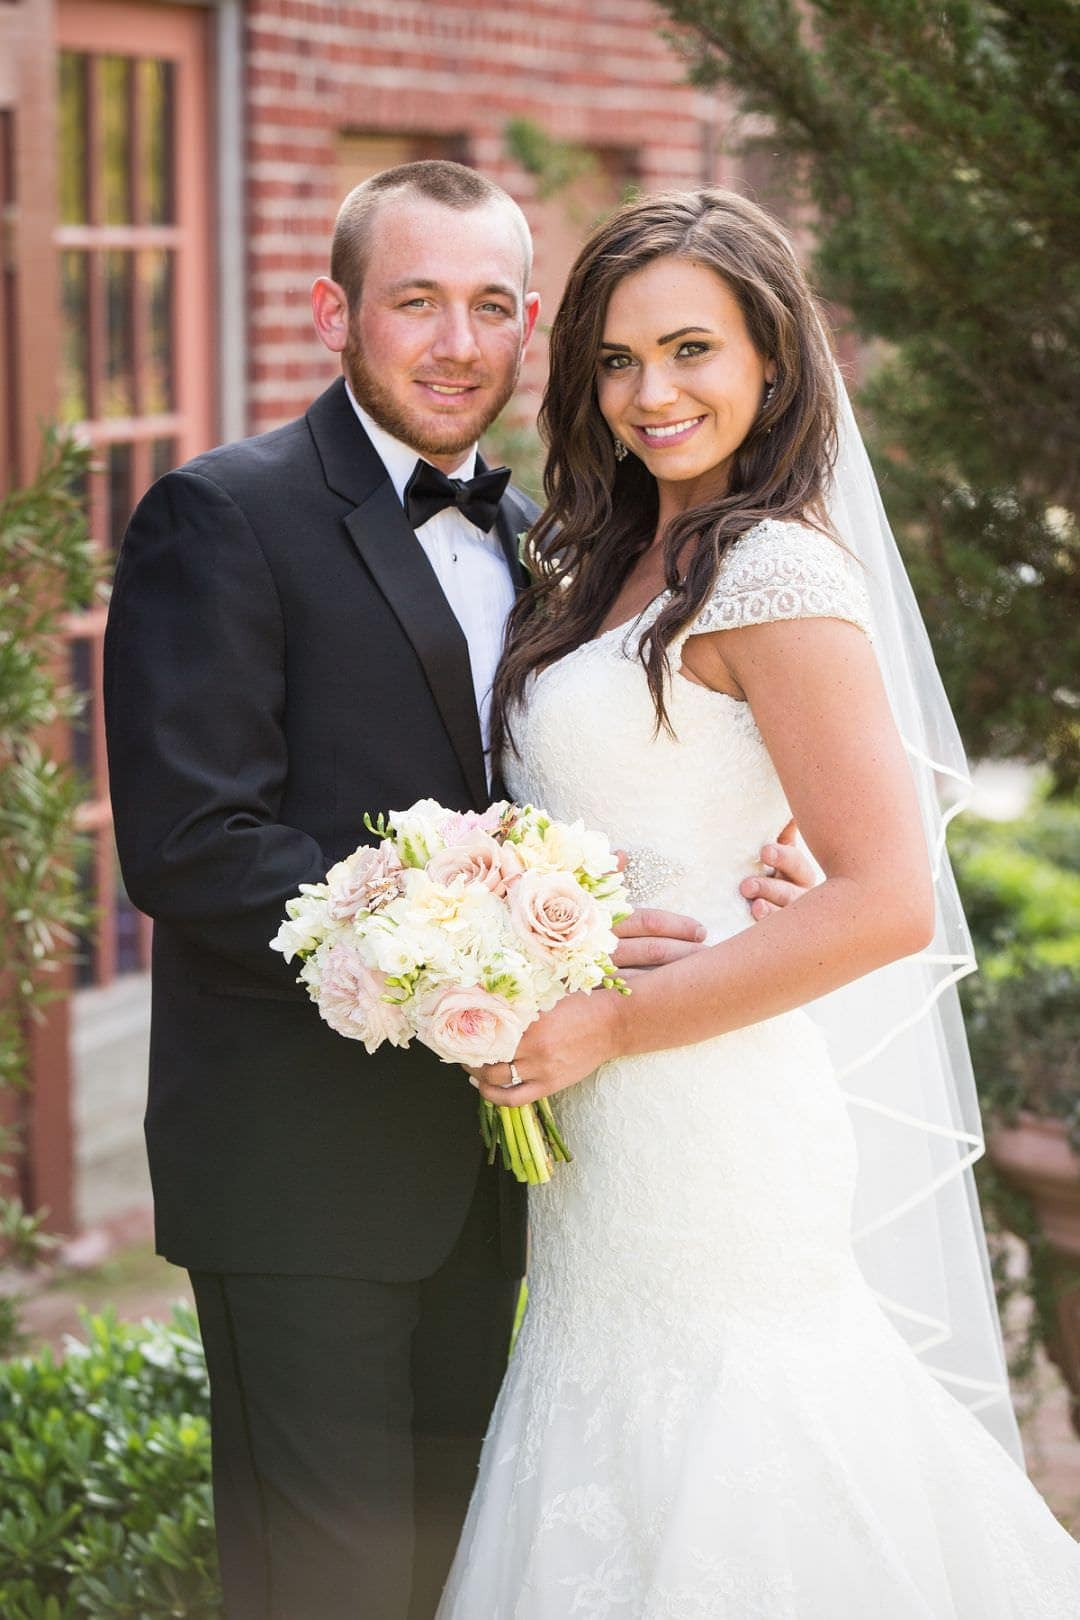 wedding-hall-at-senates-end-2015-26